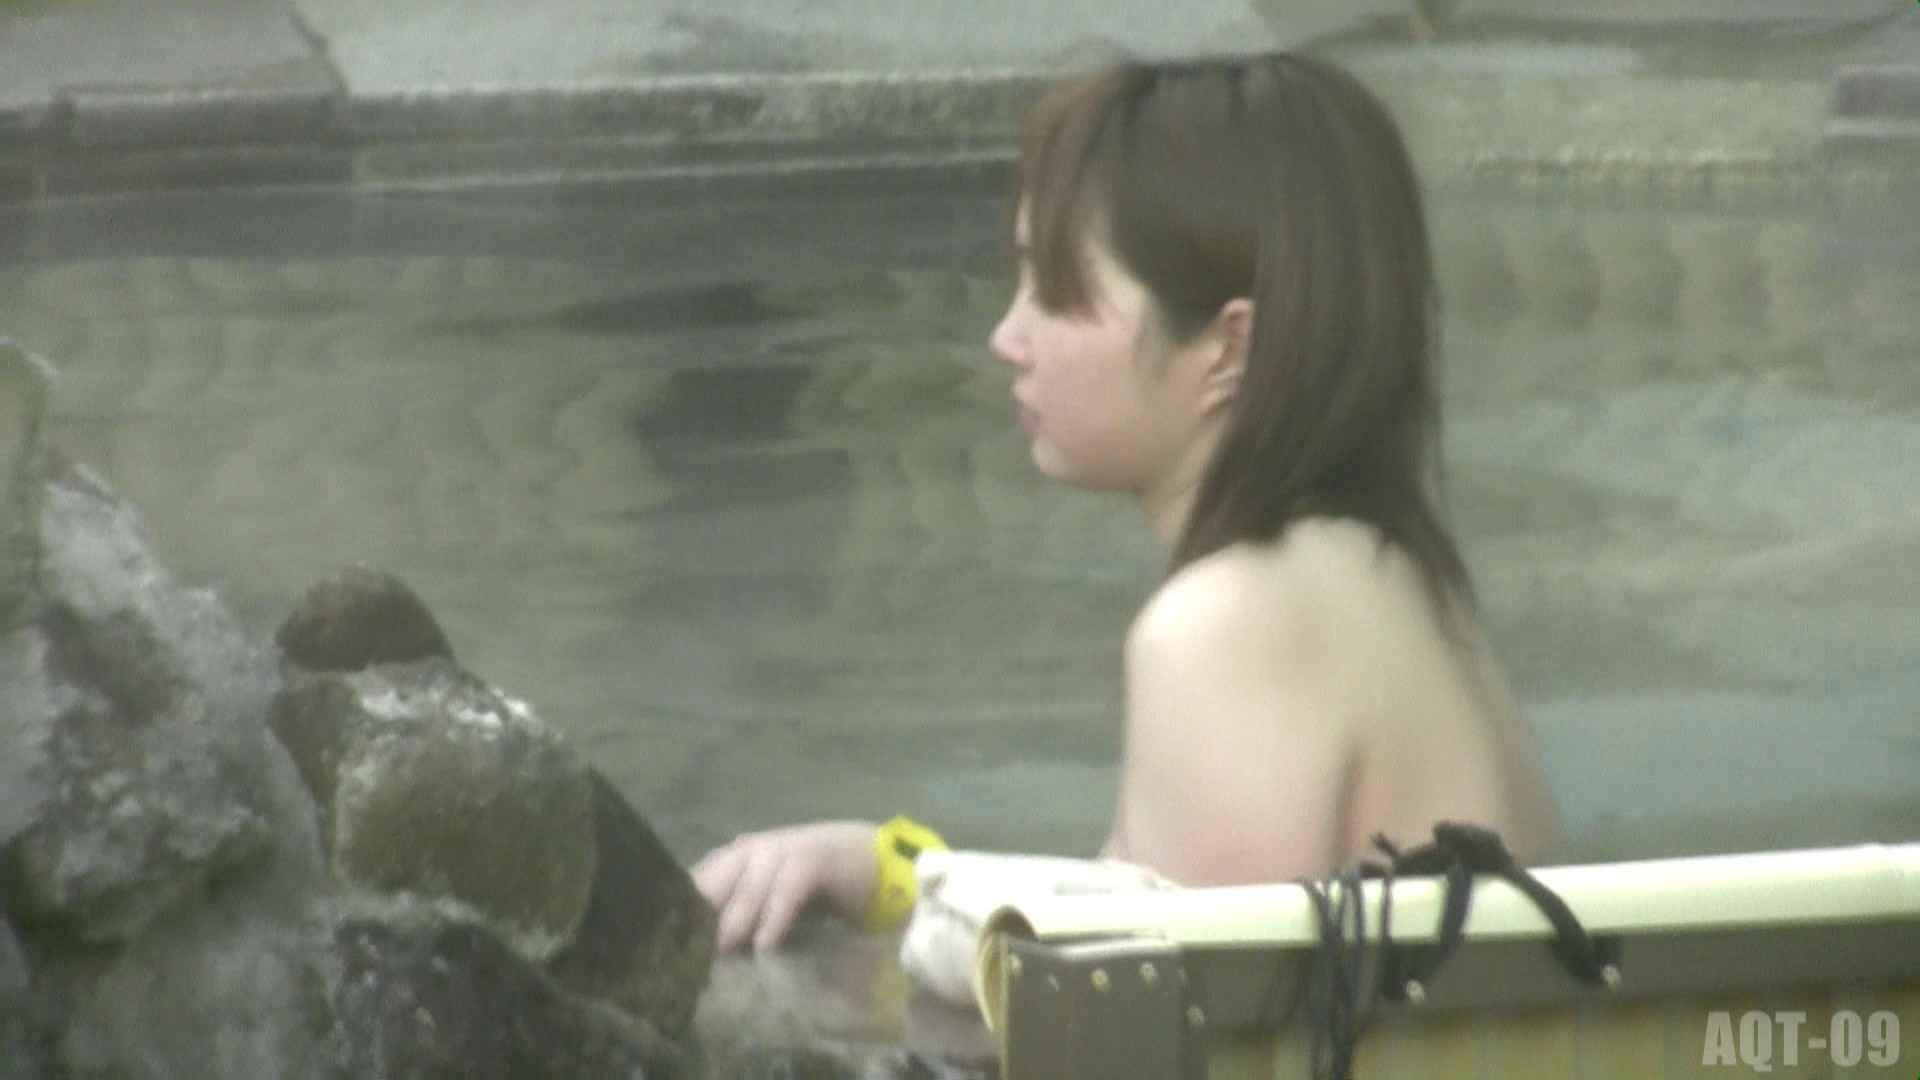 Aquaな露天風呂Vol.781 OLセックス 盗撮動画紹介 110画像 29